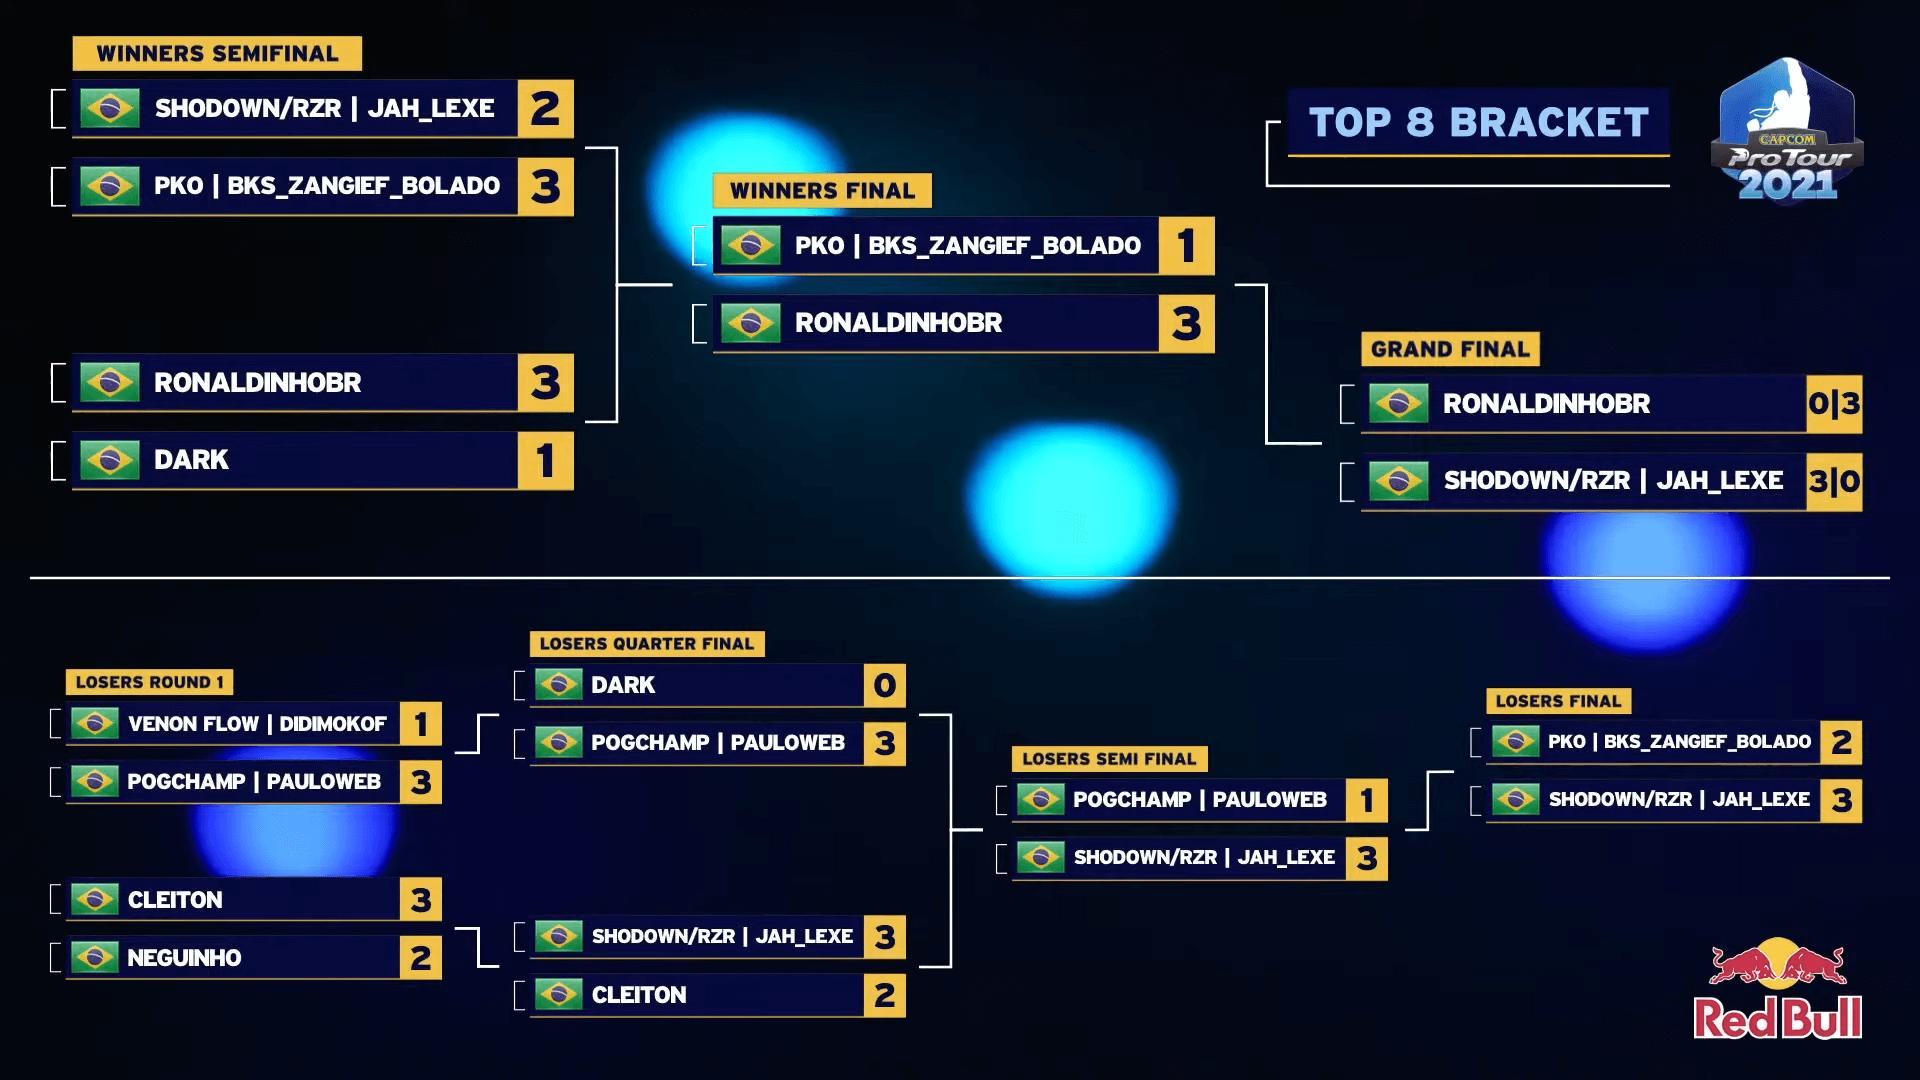 CPT 2021 Brazil 1 - Top 8 Brackets